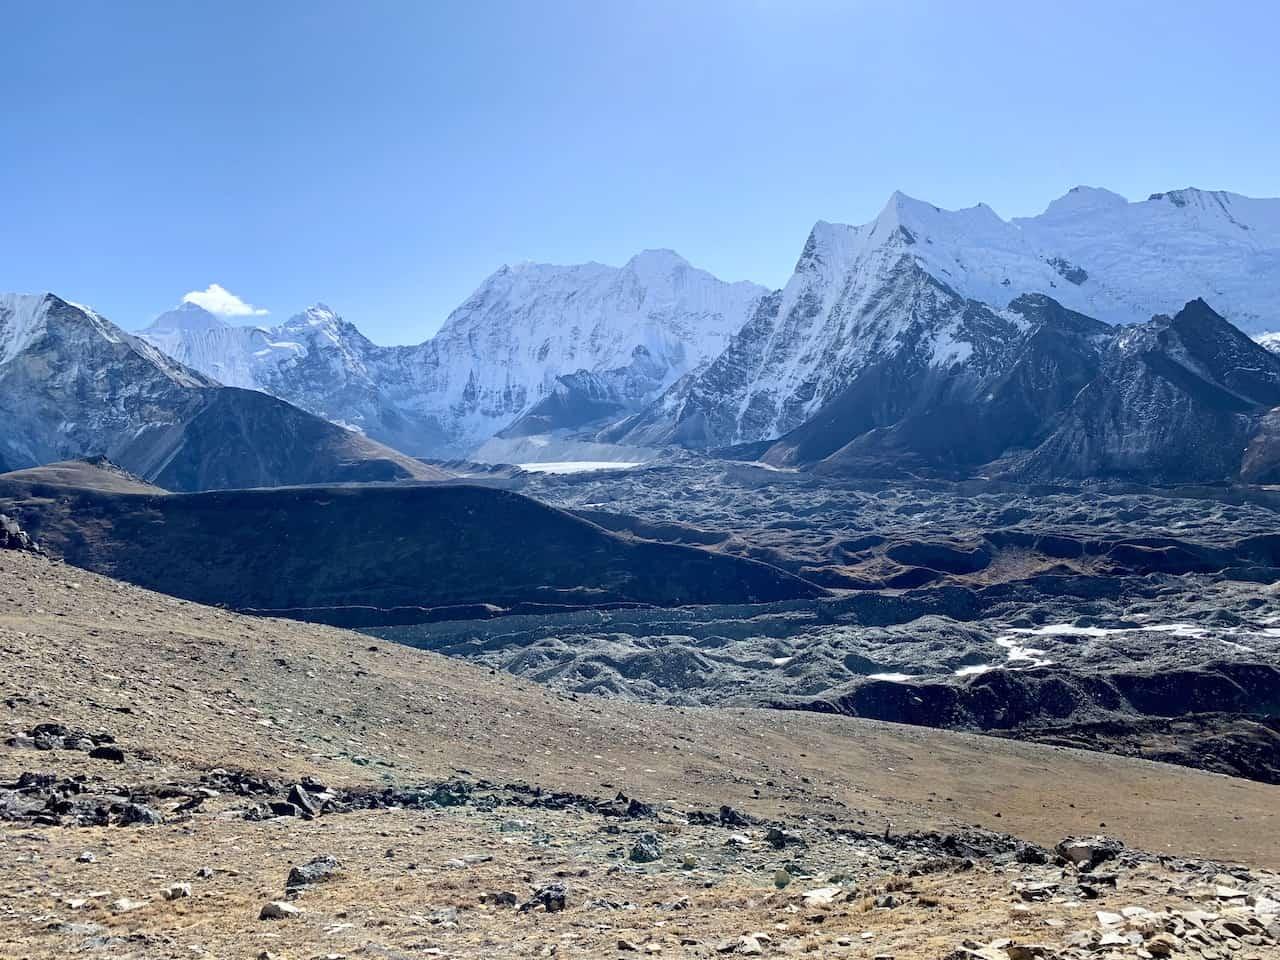 Chukhung Ri Glacier